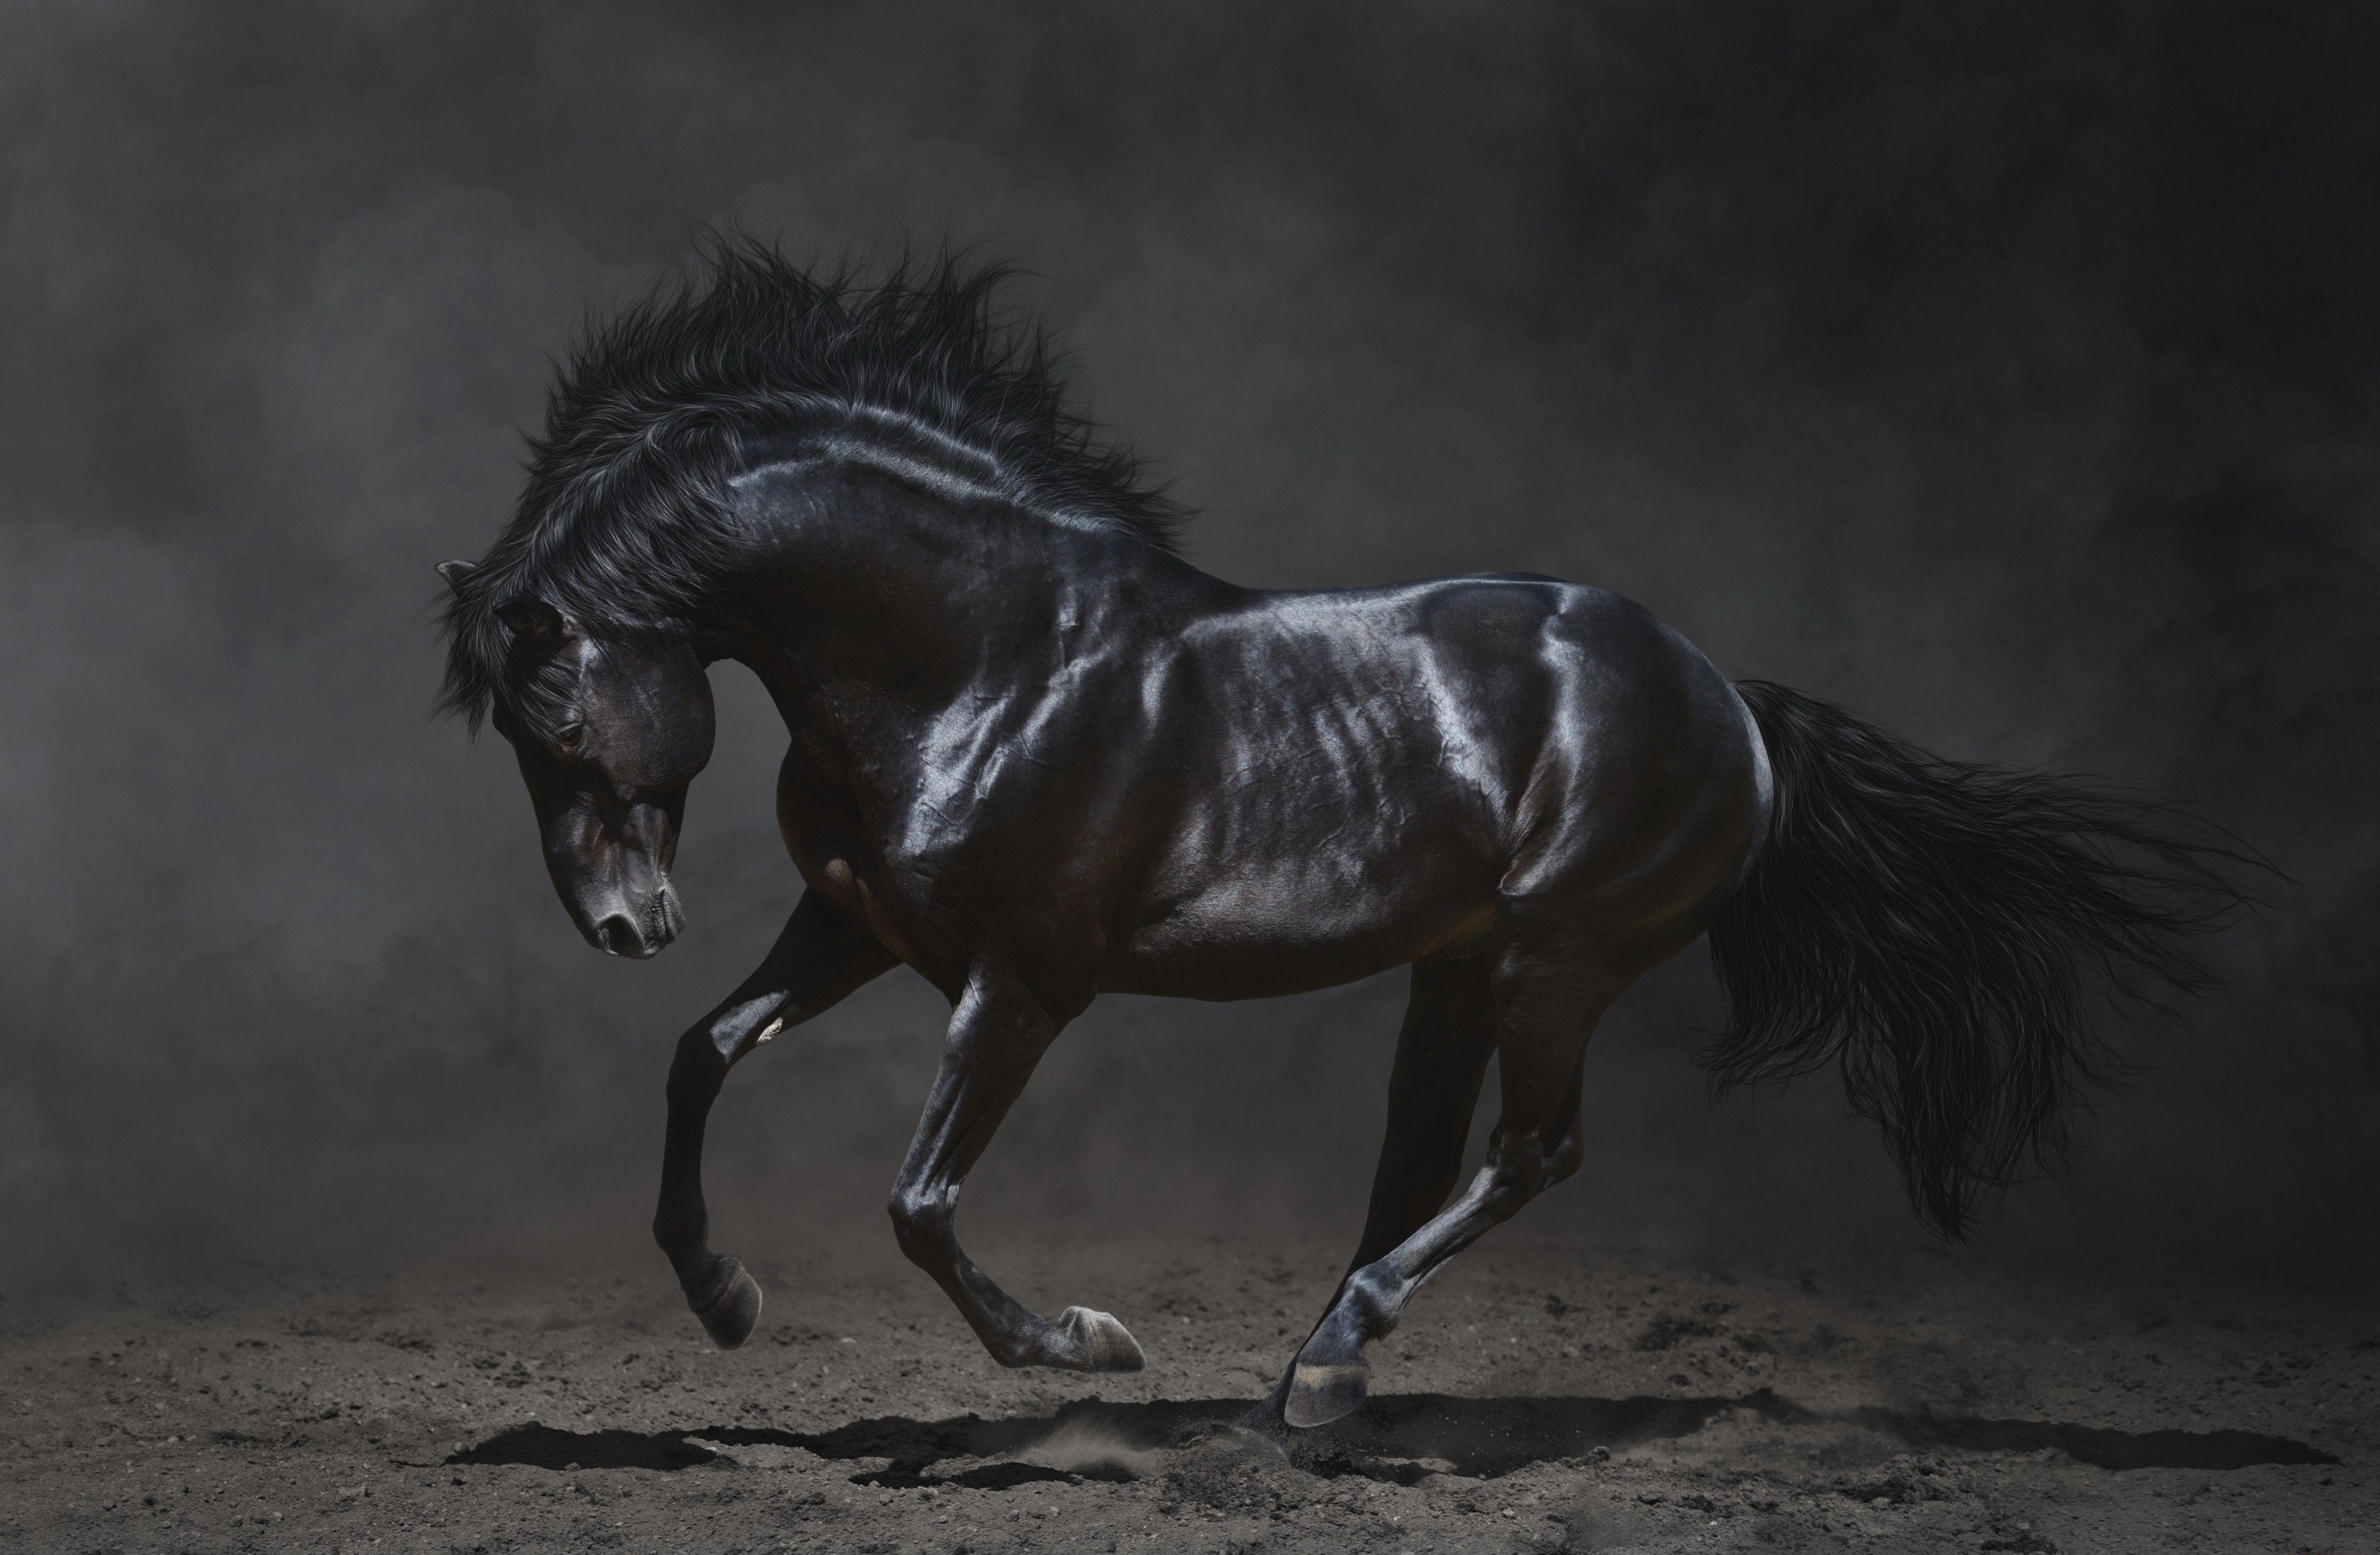 Black Horse Wallpapers - Wallpaper Cave - photo#3